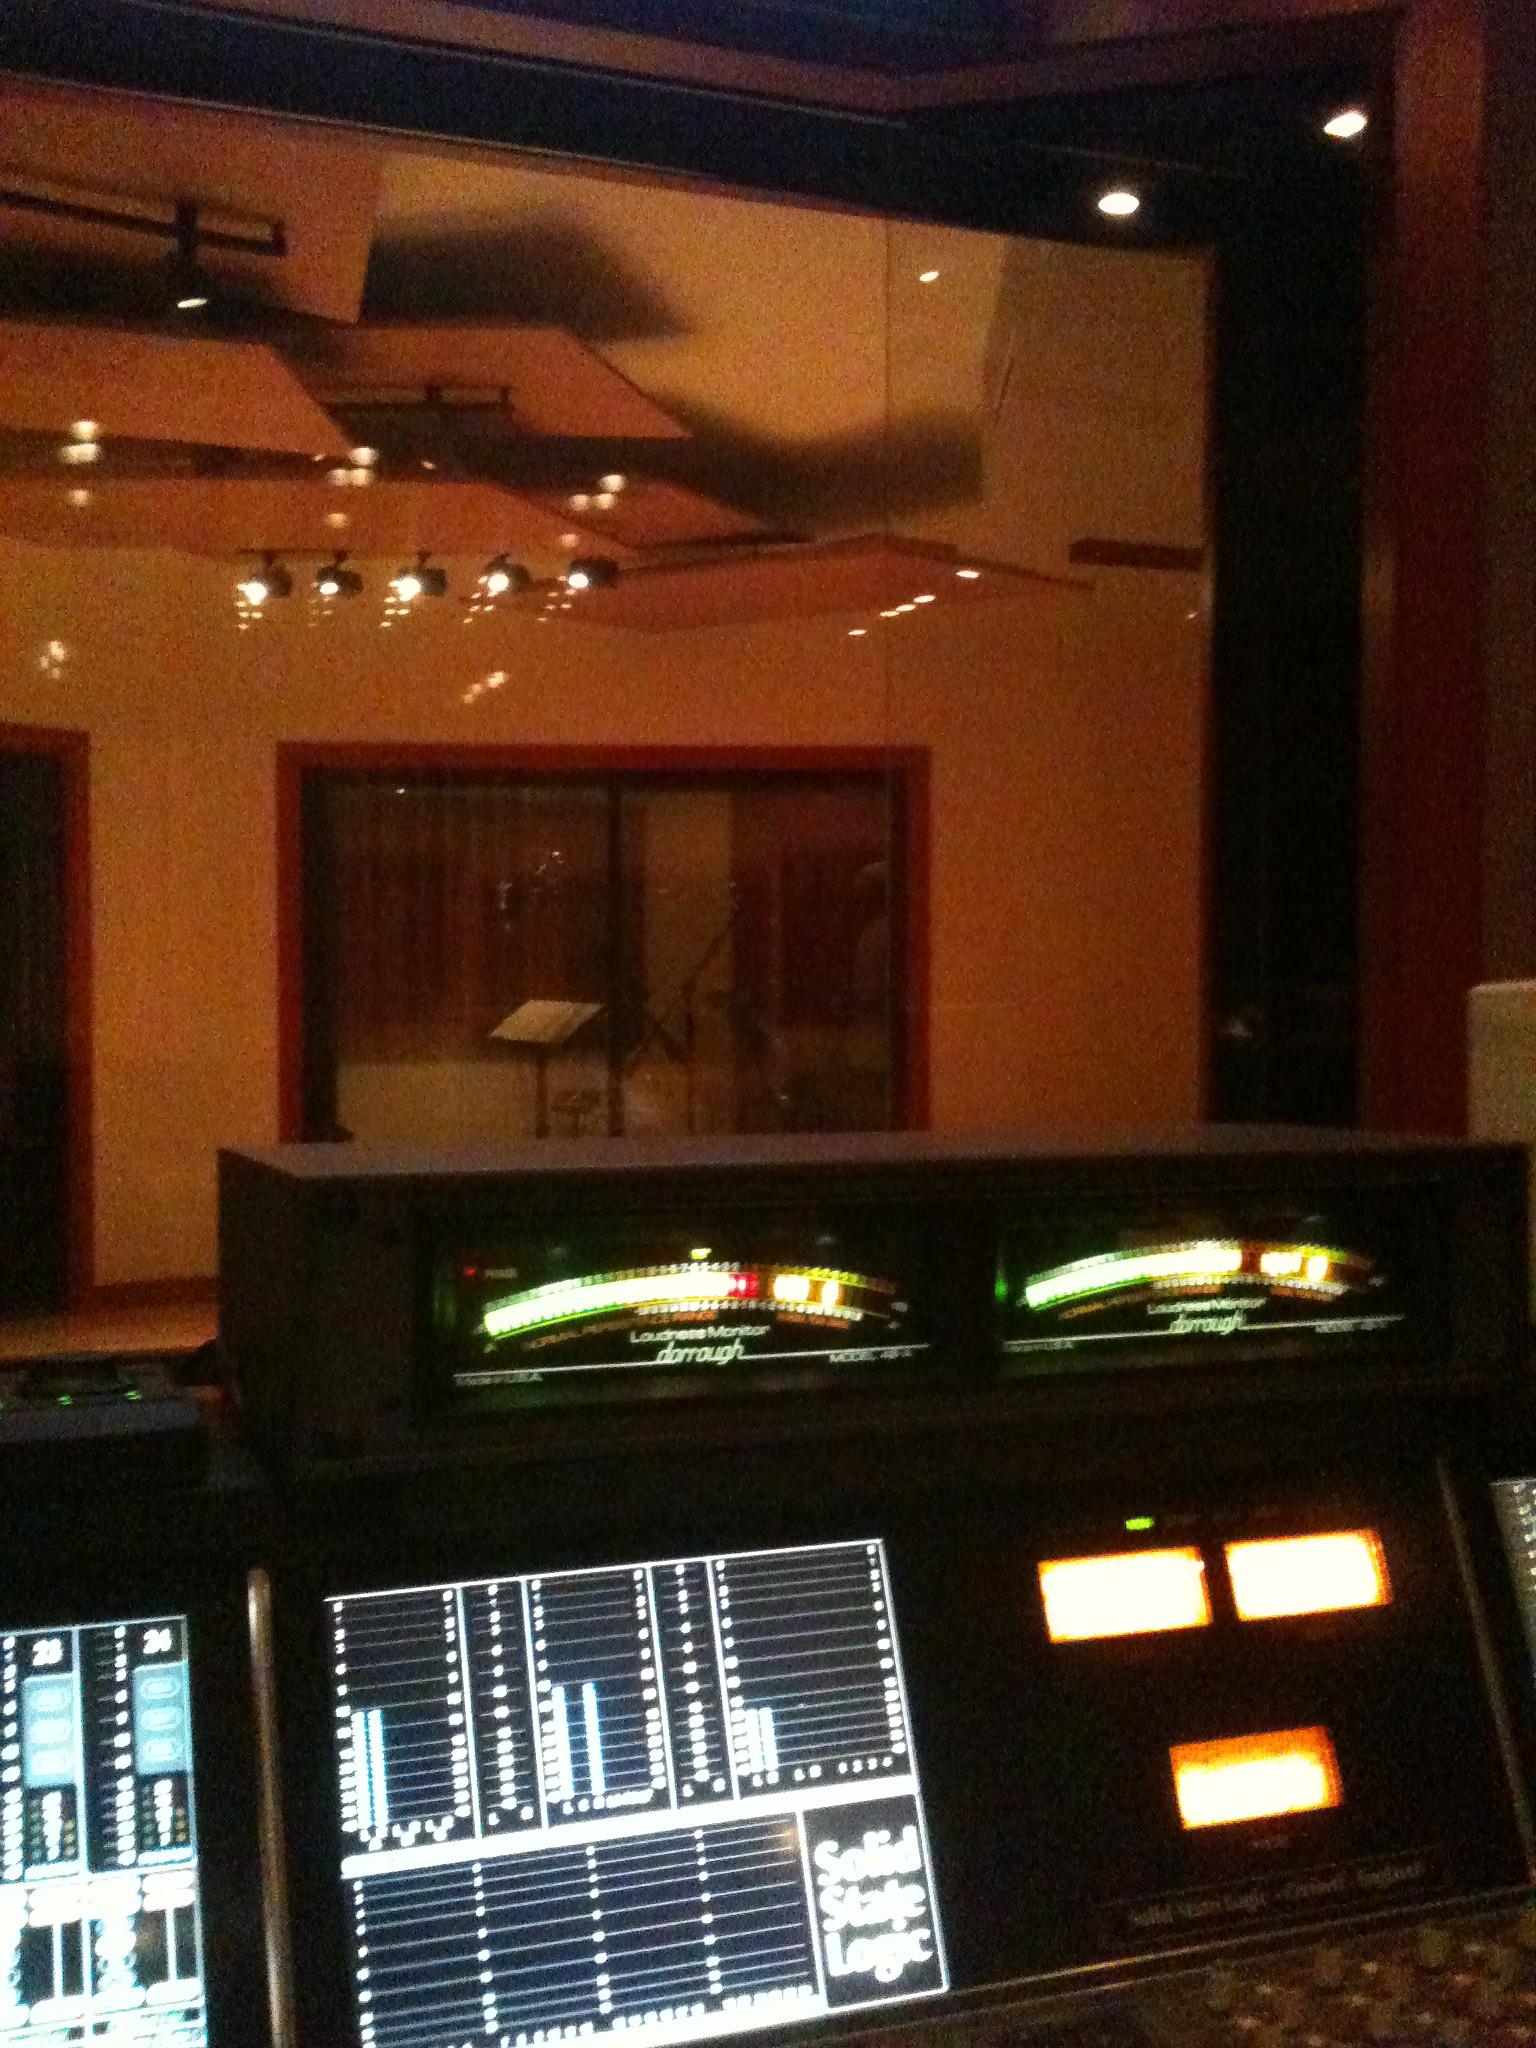 late night overdub session